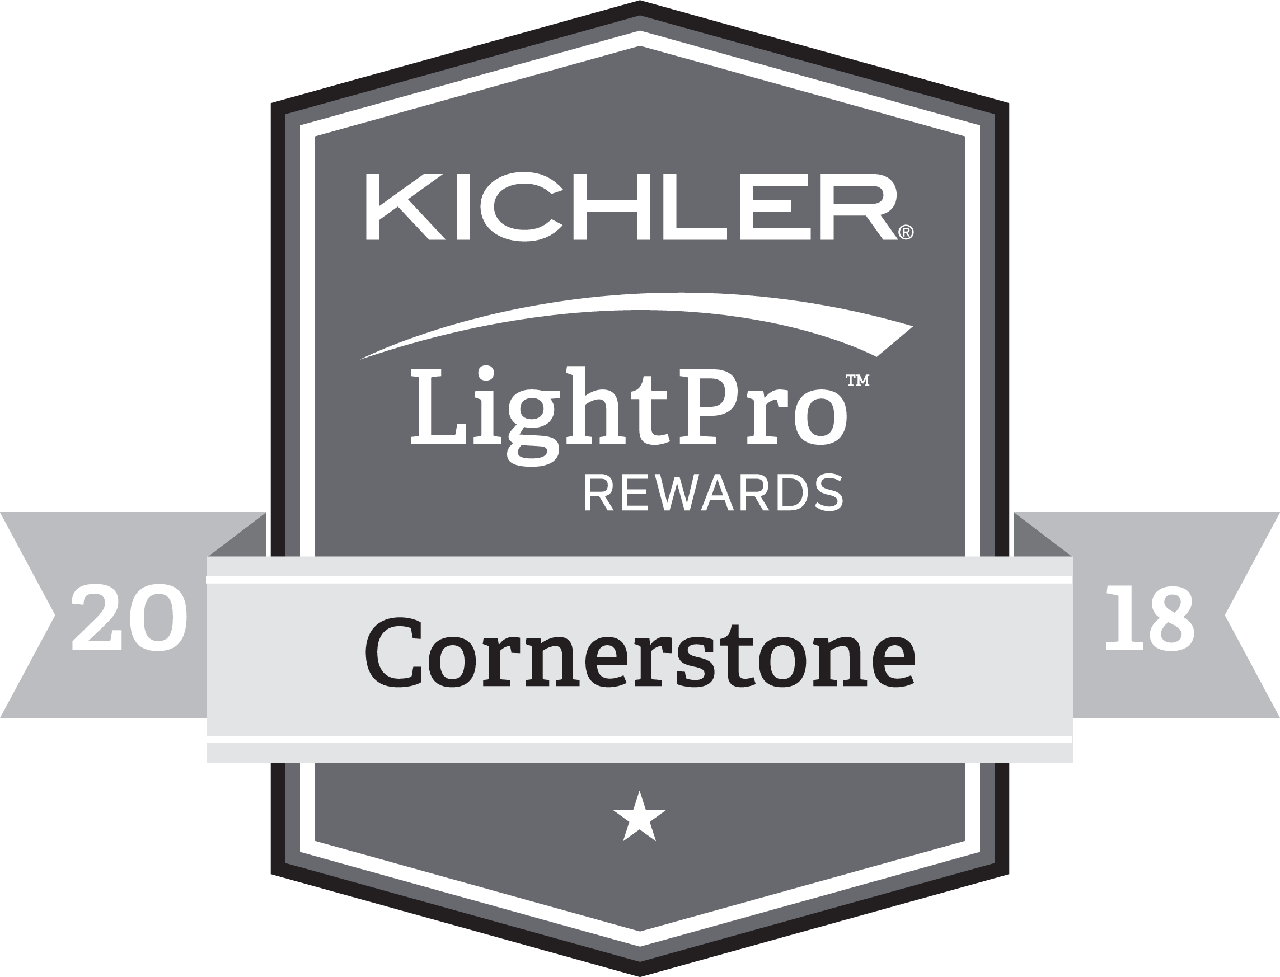 lightpro_cornerstone_2018_ol.png